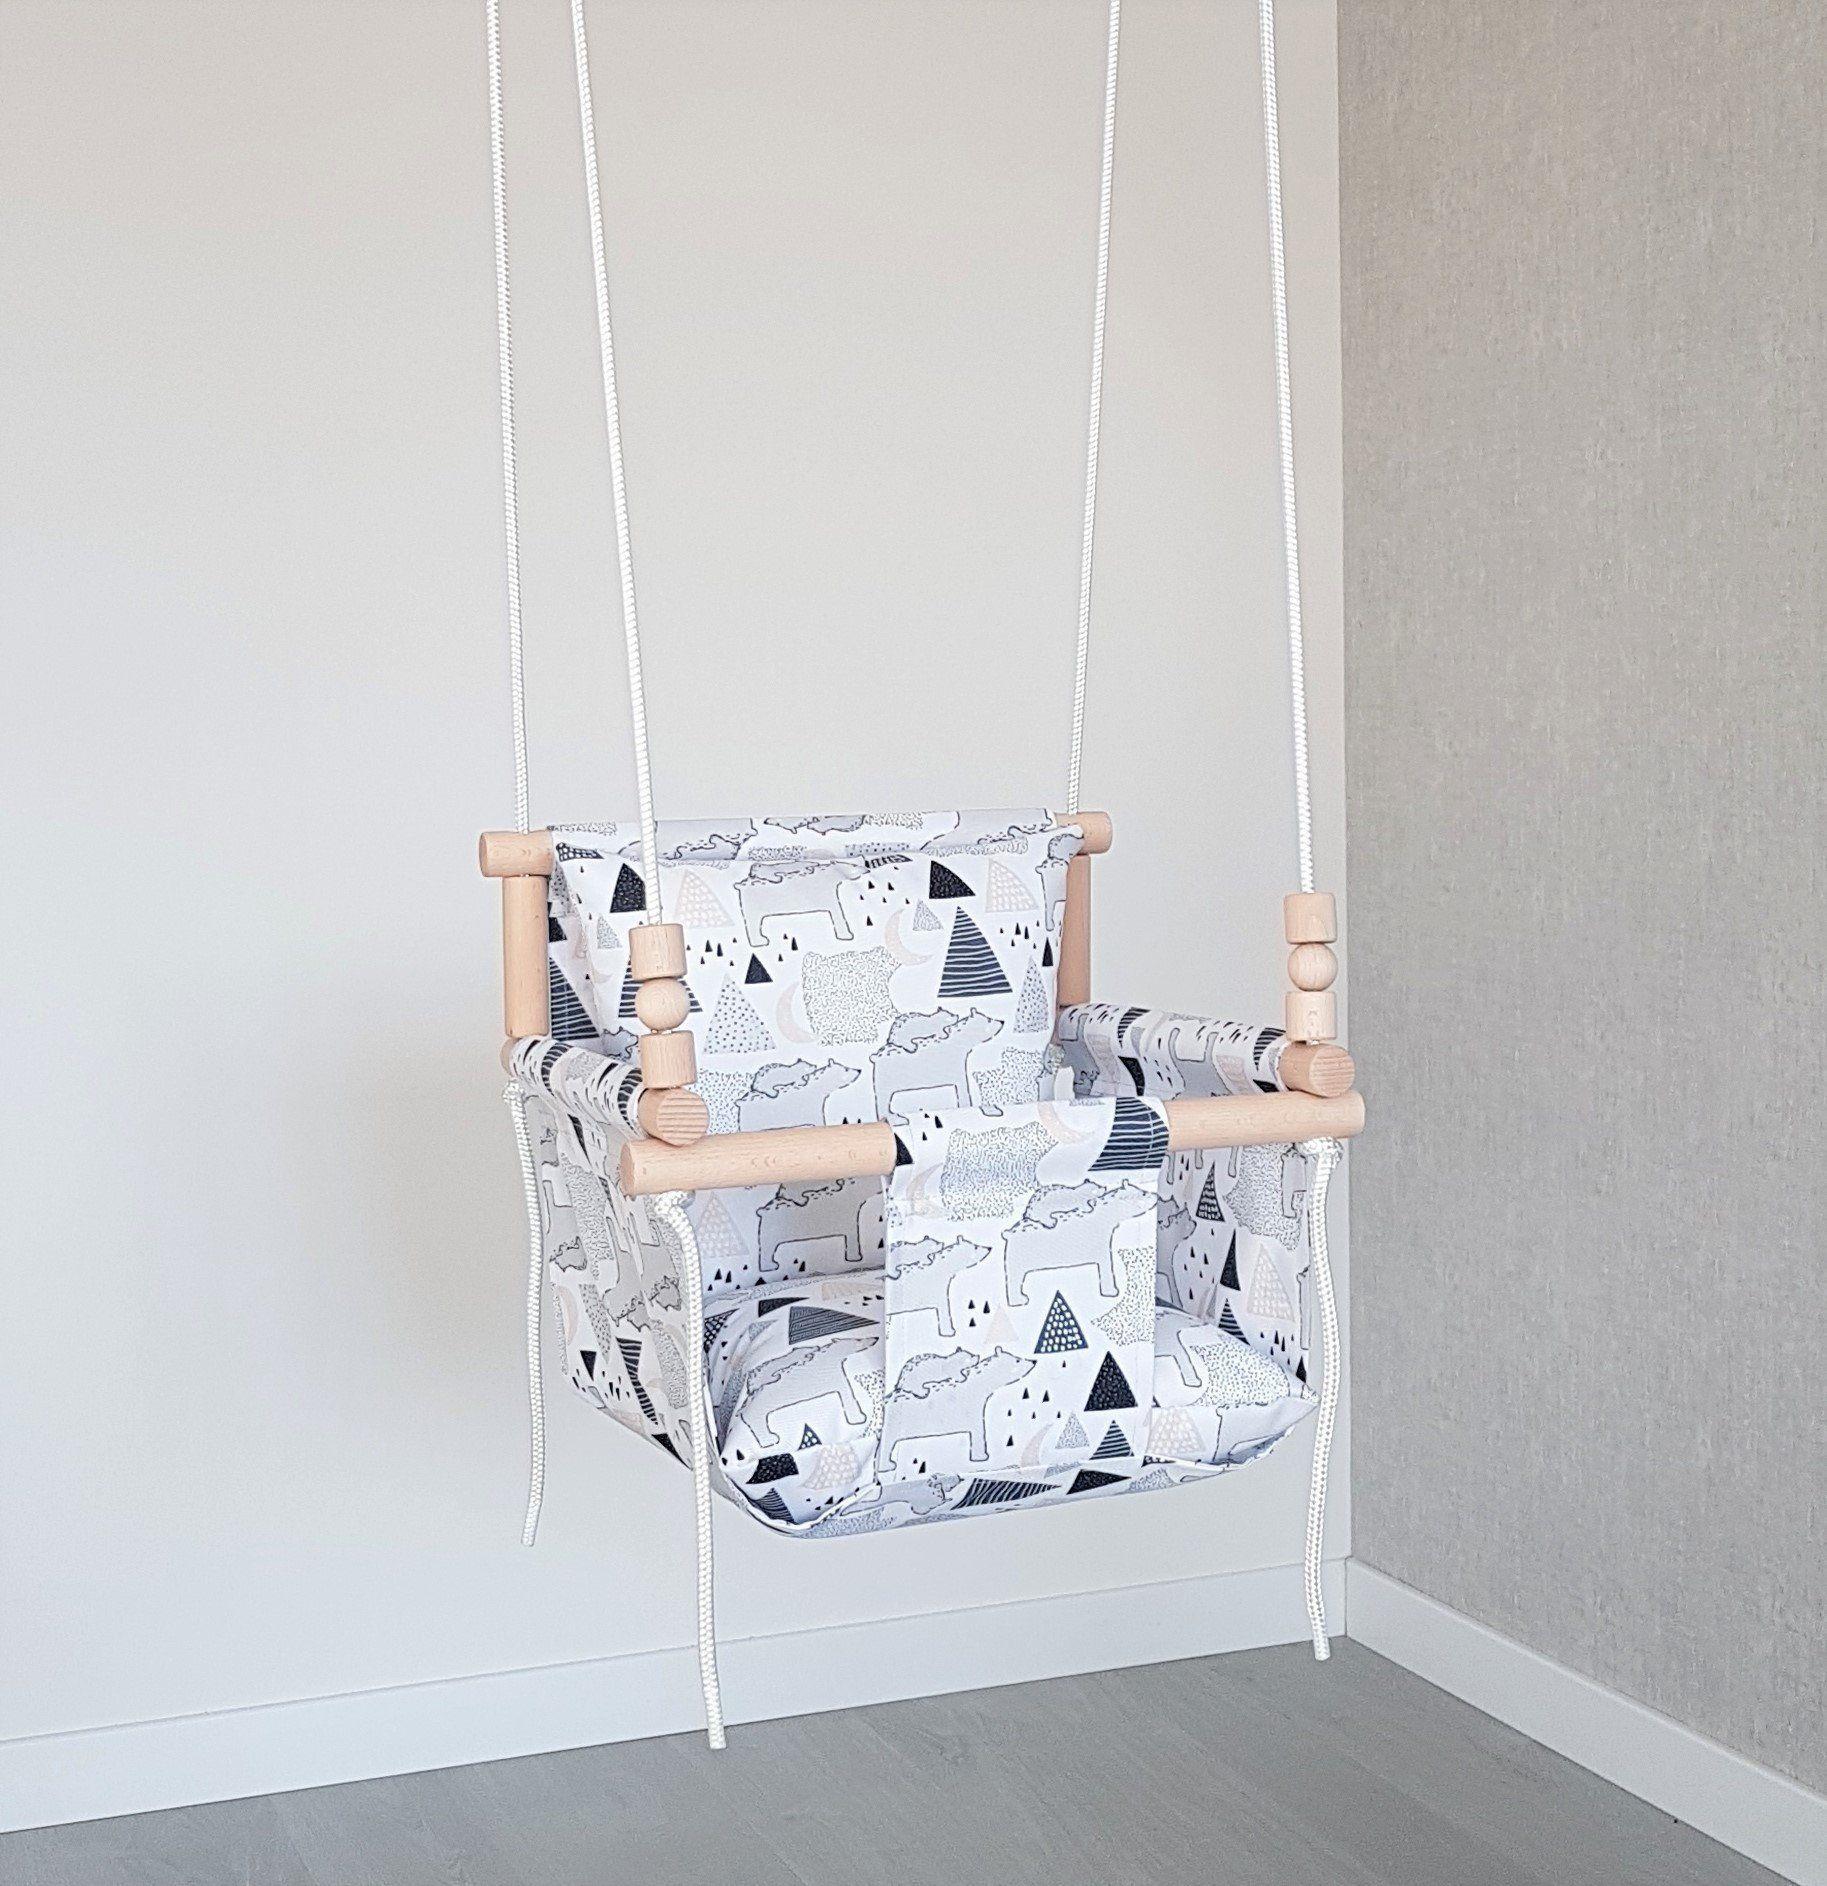 Weatherproof Comfortable Design Baby Swing Polar Bear Outdoor Indoor Swing Toddler Swing First Birthday Gift Chair Hammock Baby Swing Toddler Swing Baby Design Baby Swings